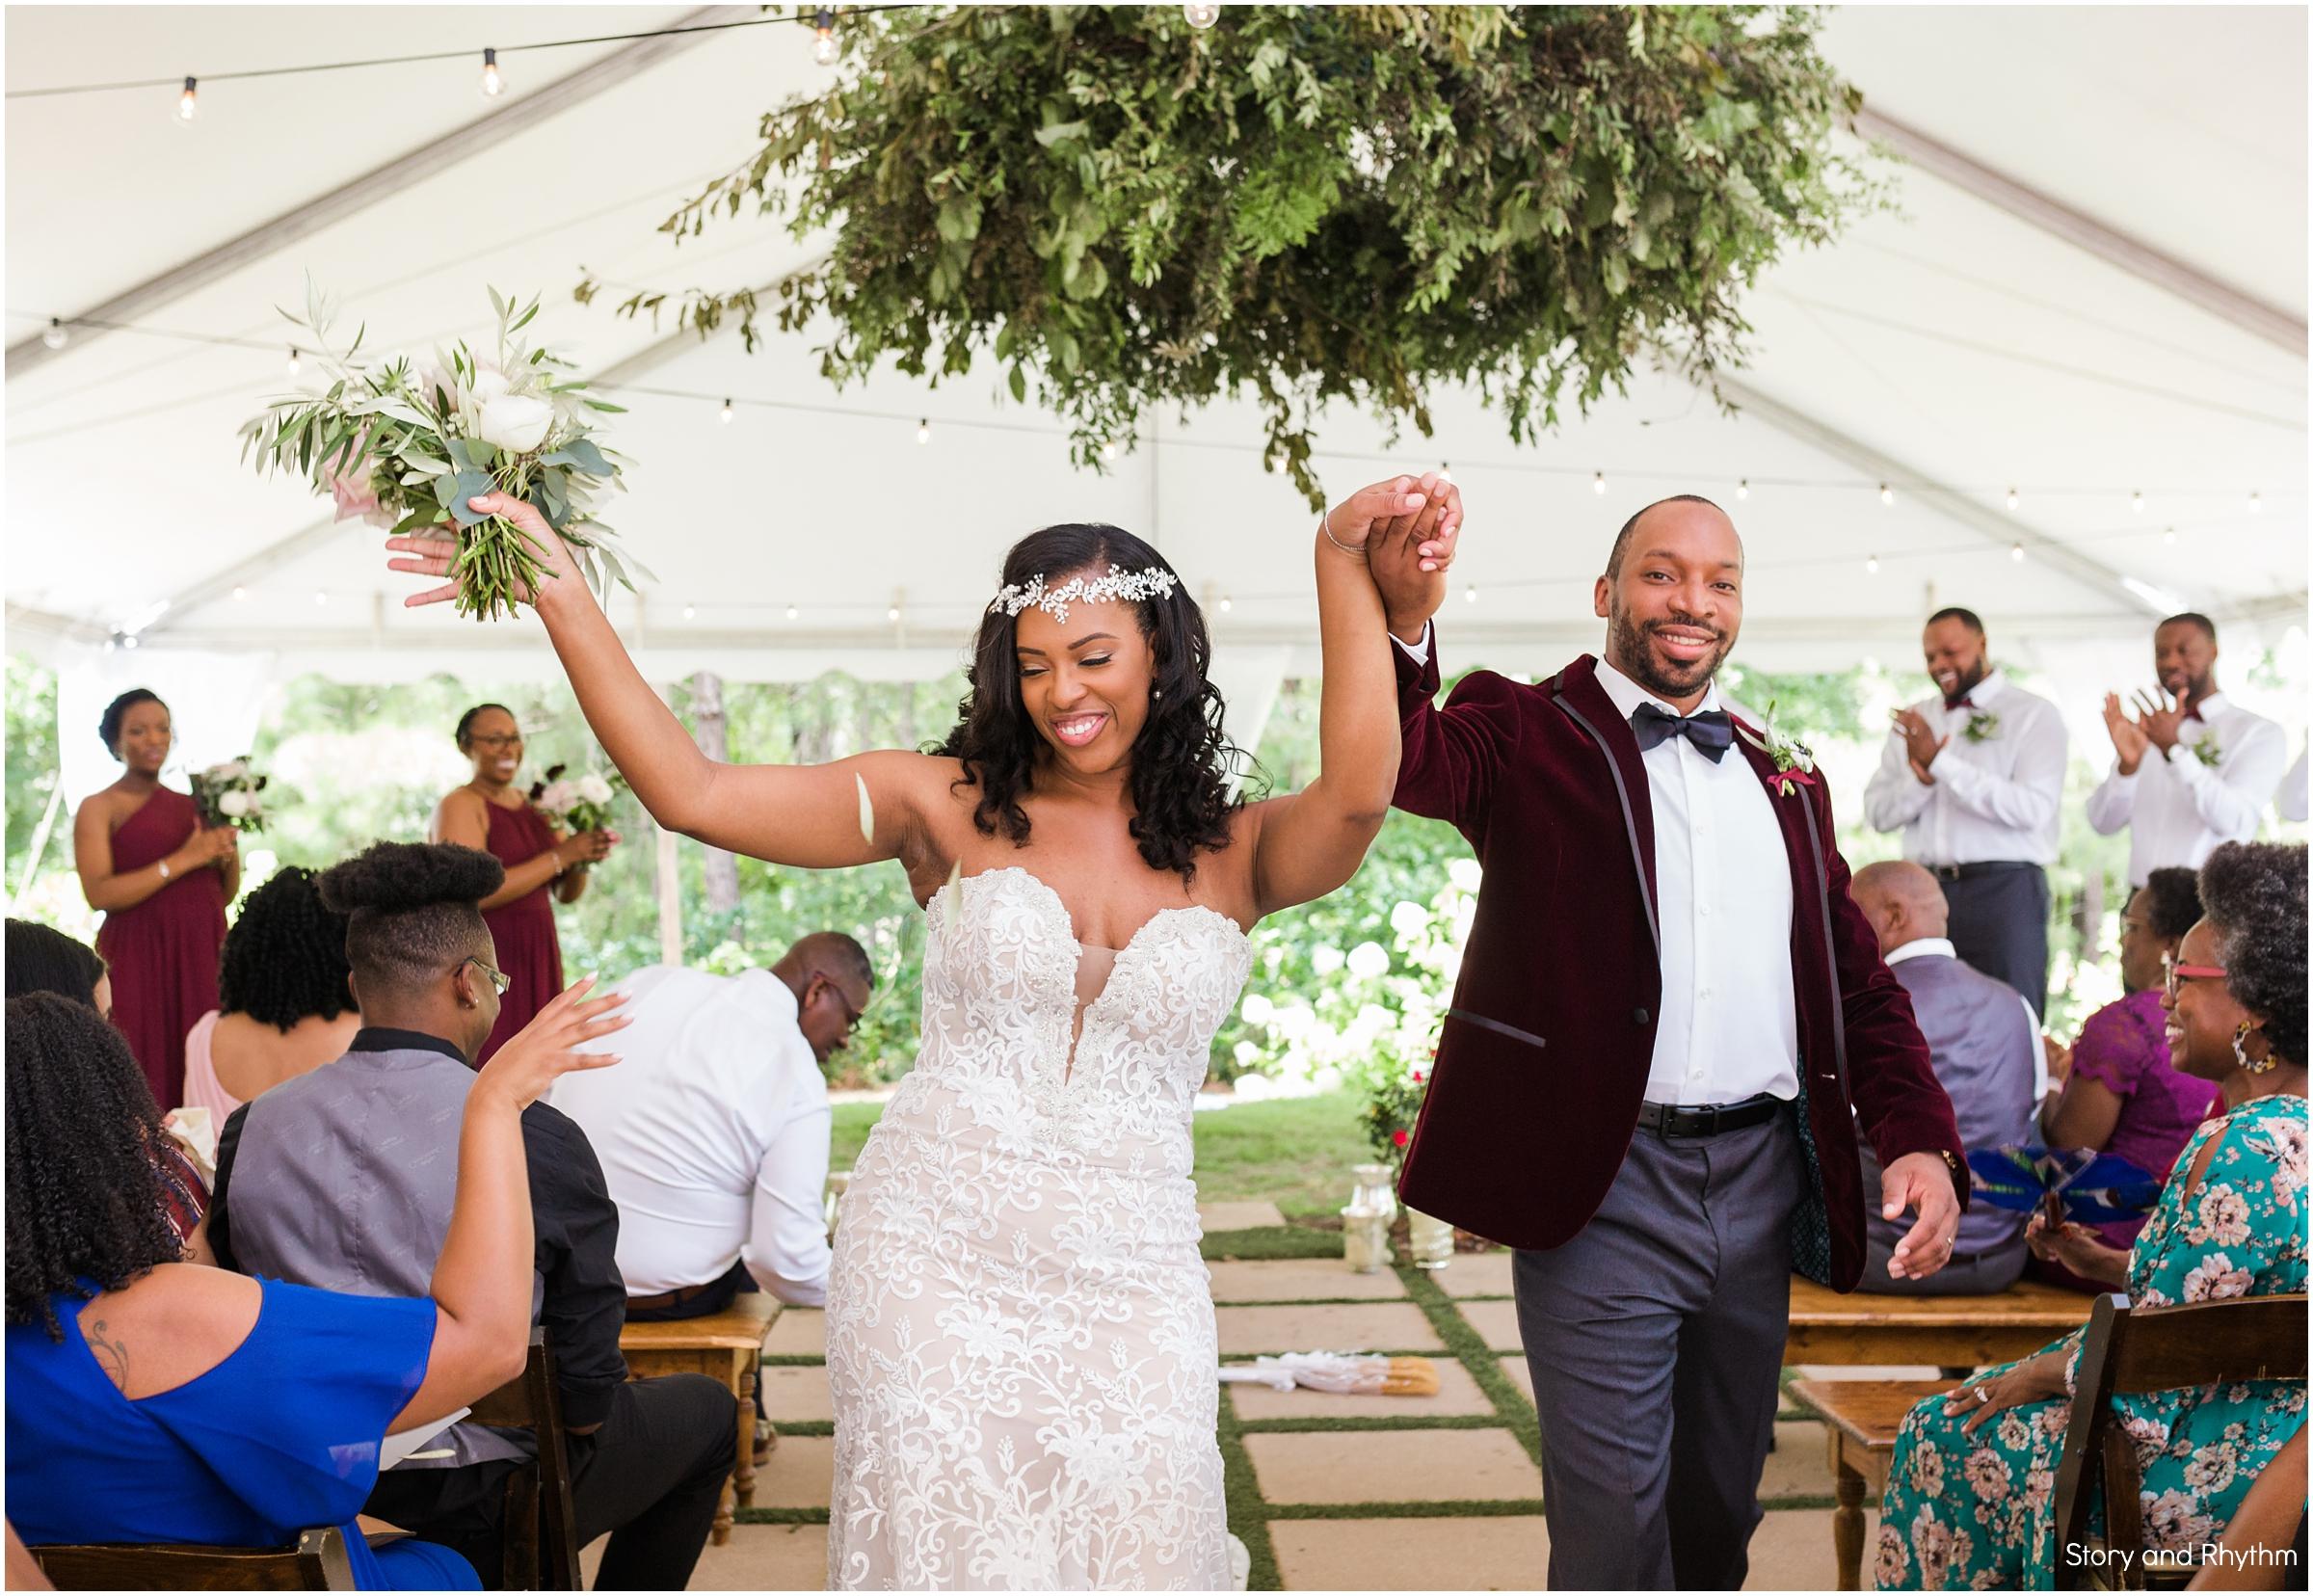 Wedding photographer in Raleigh NC